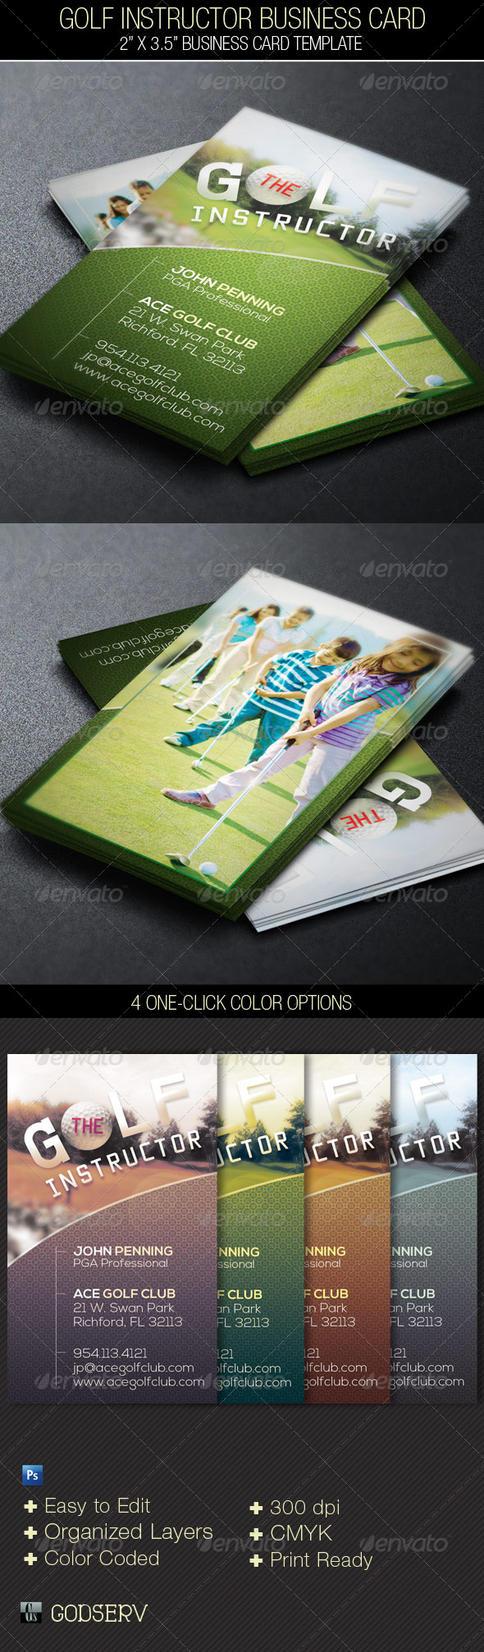 Golf instructor business plan